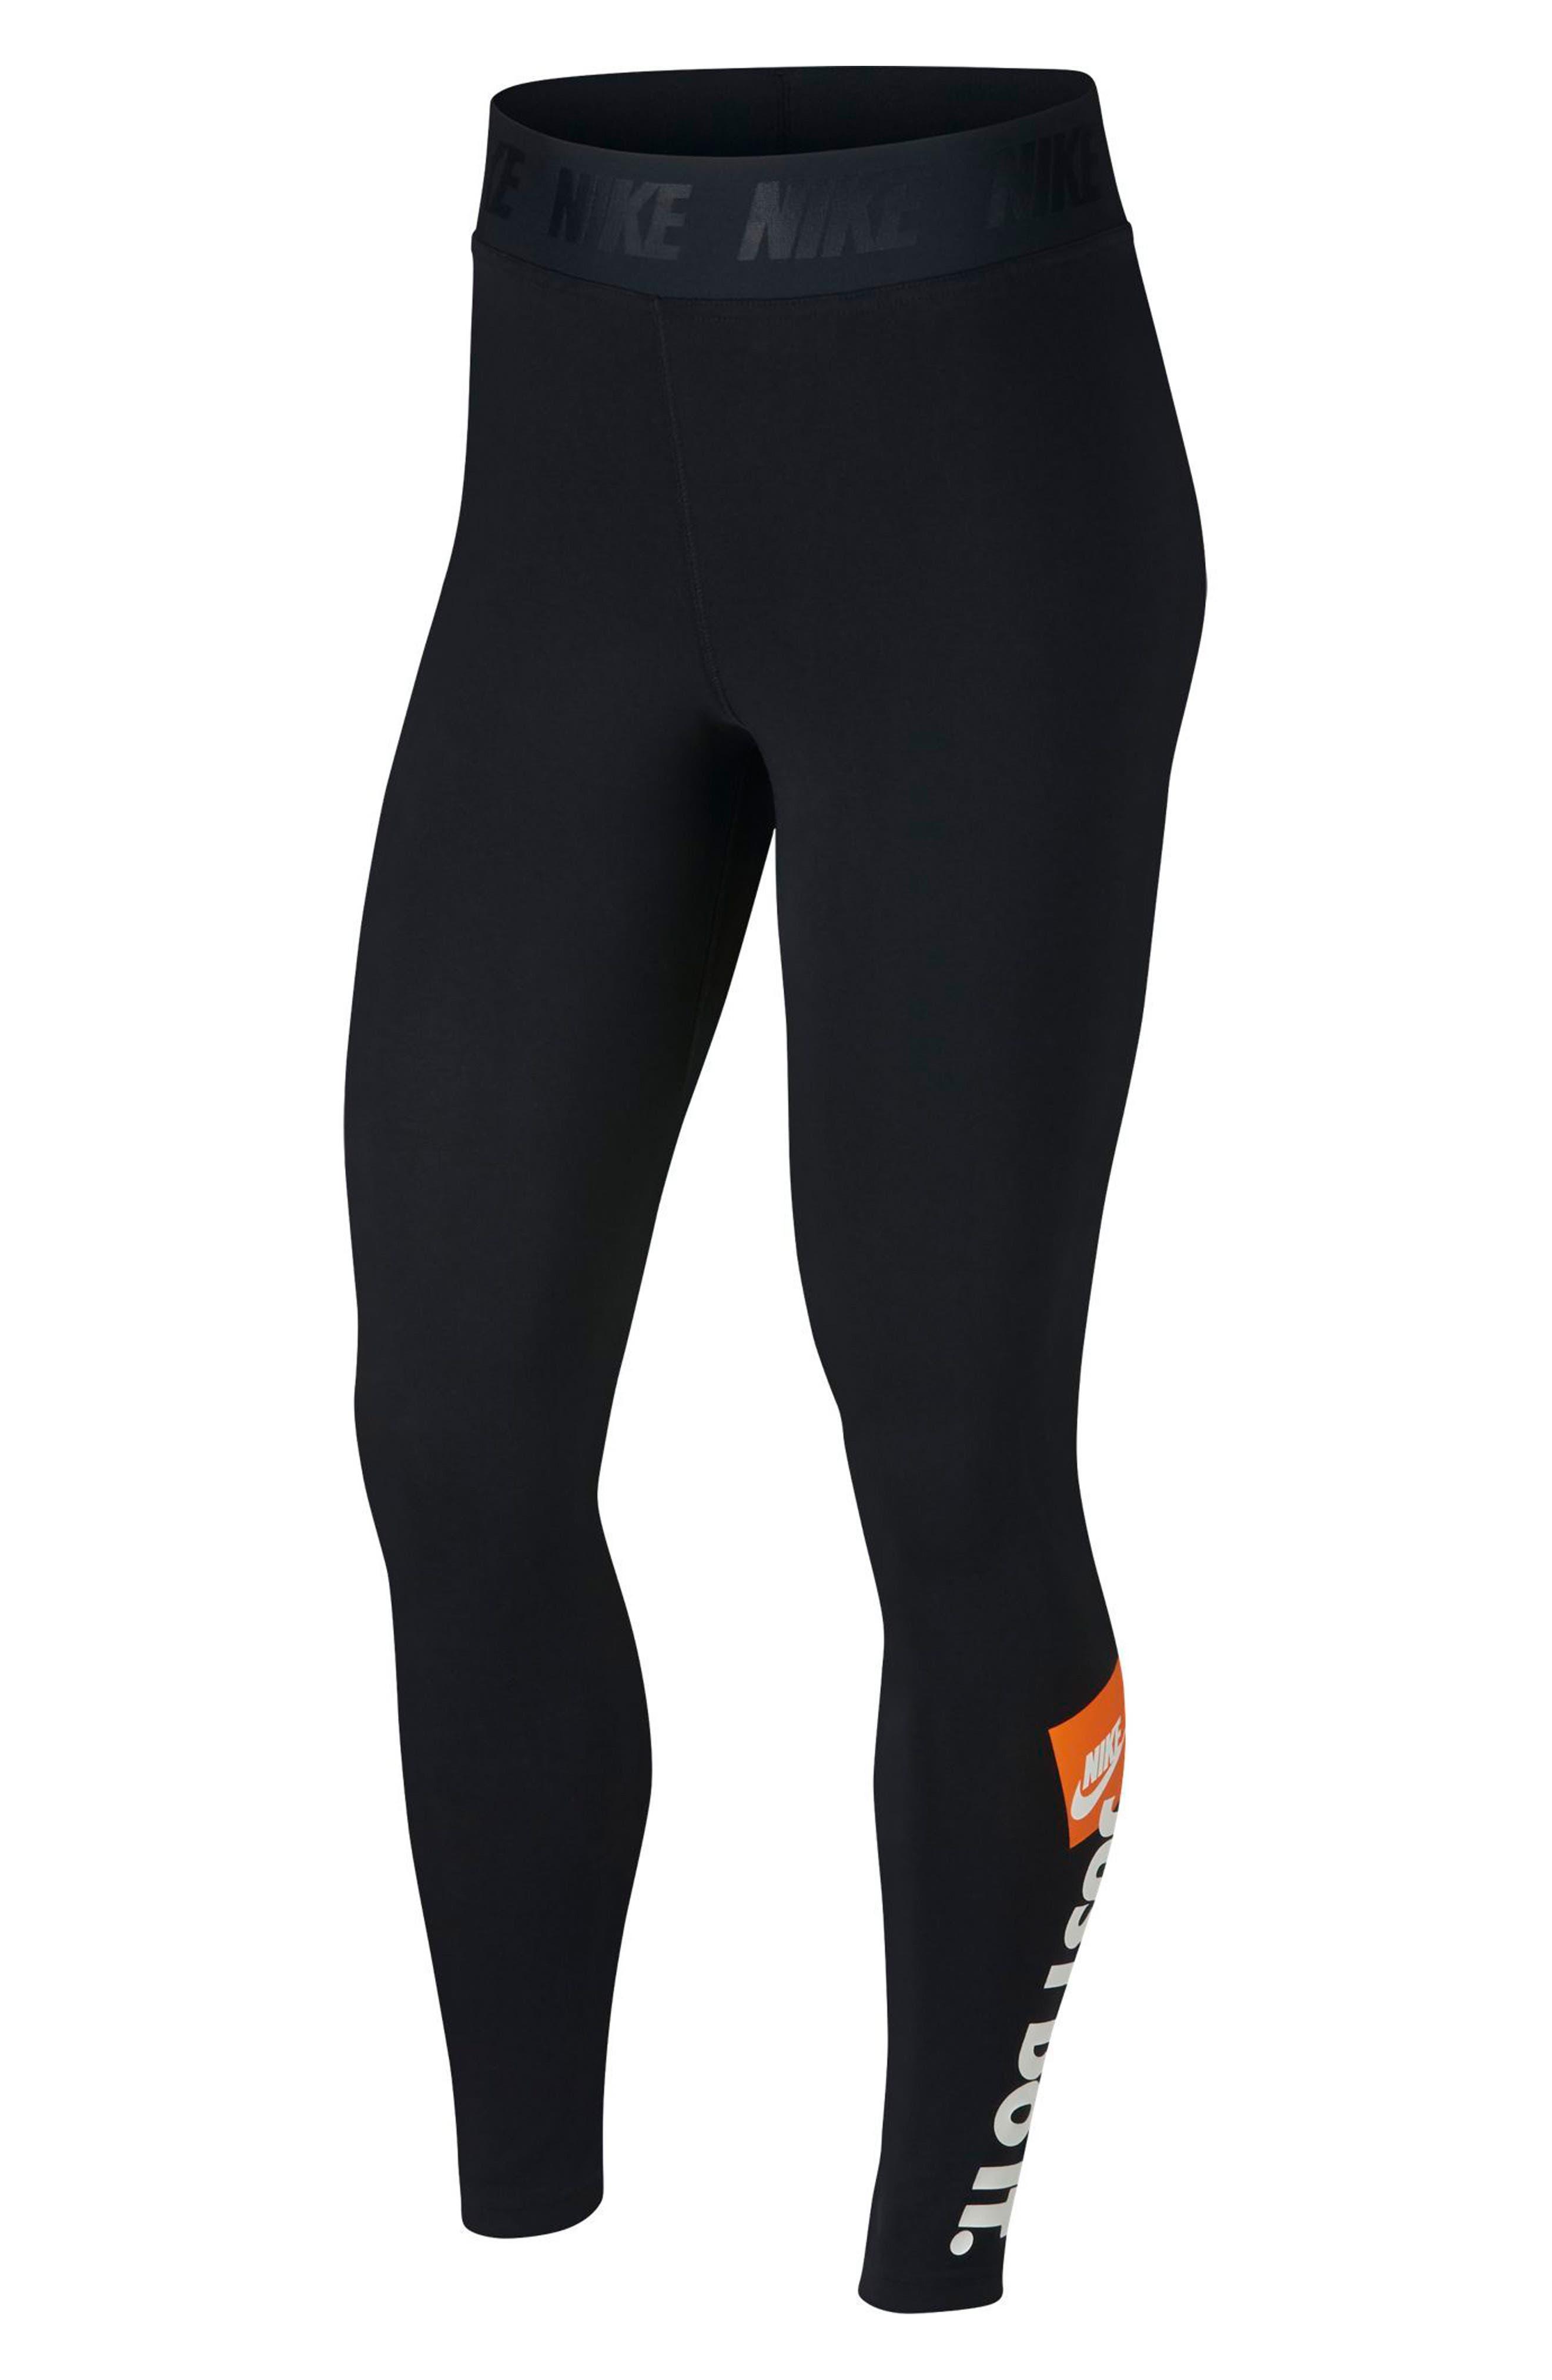 Sportswear Just Do It High Rise Women's Leggings,                         Main,                         color, BLACK